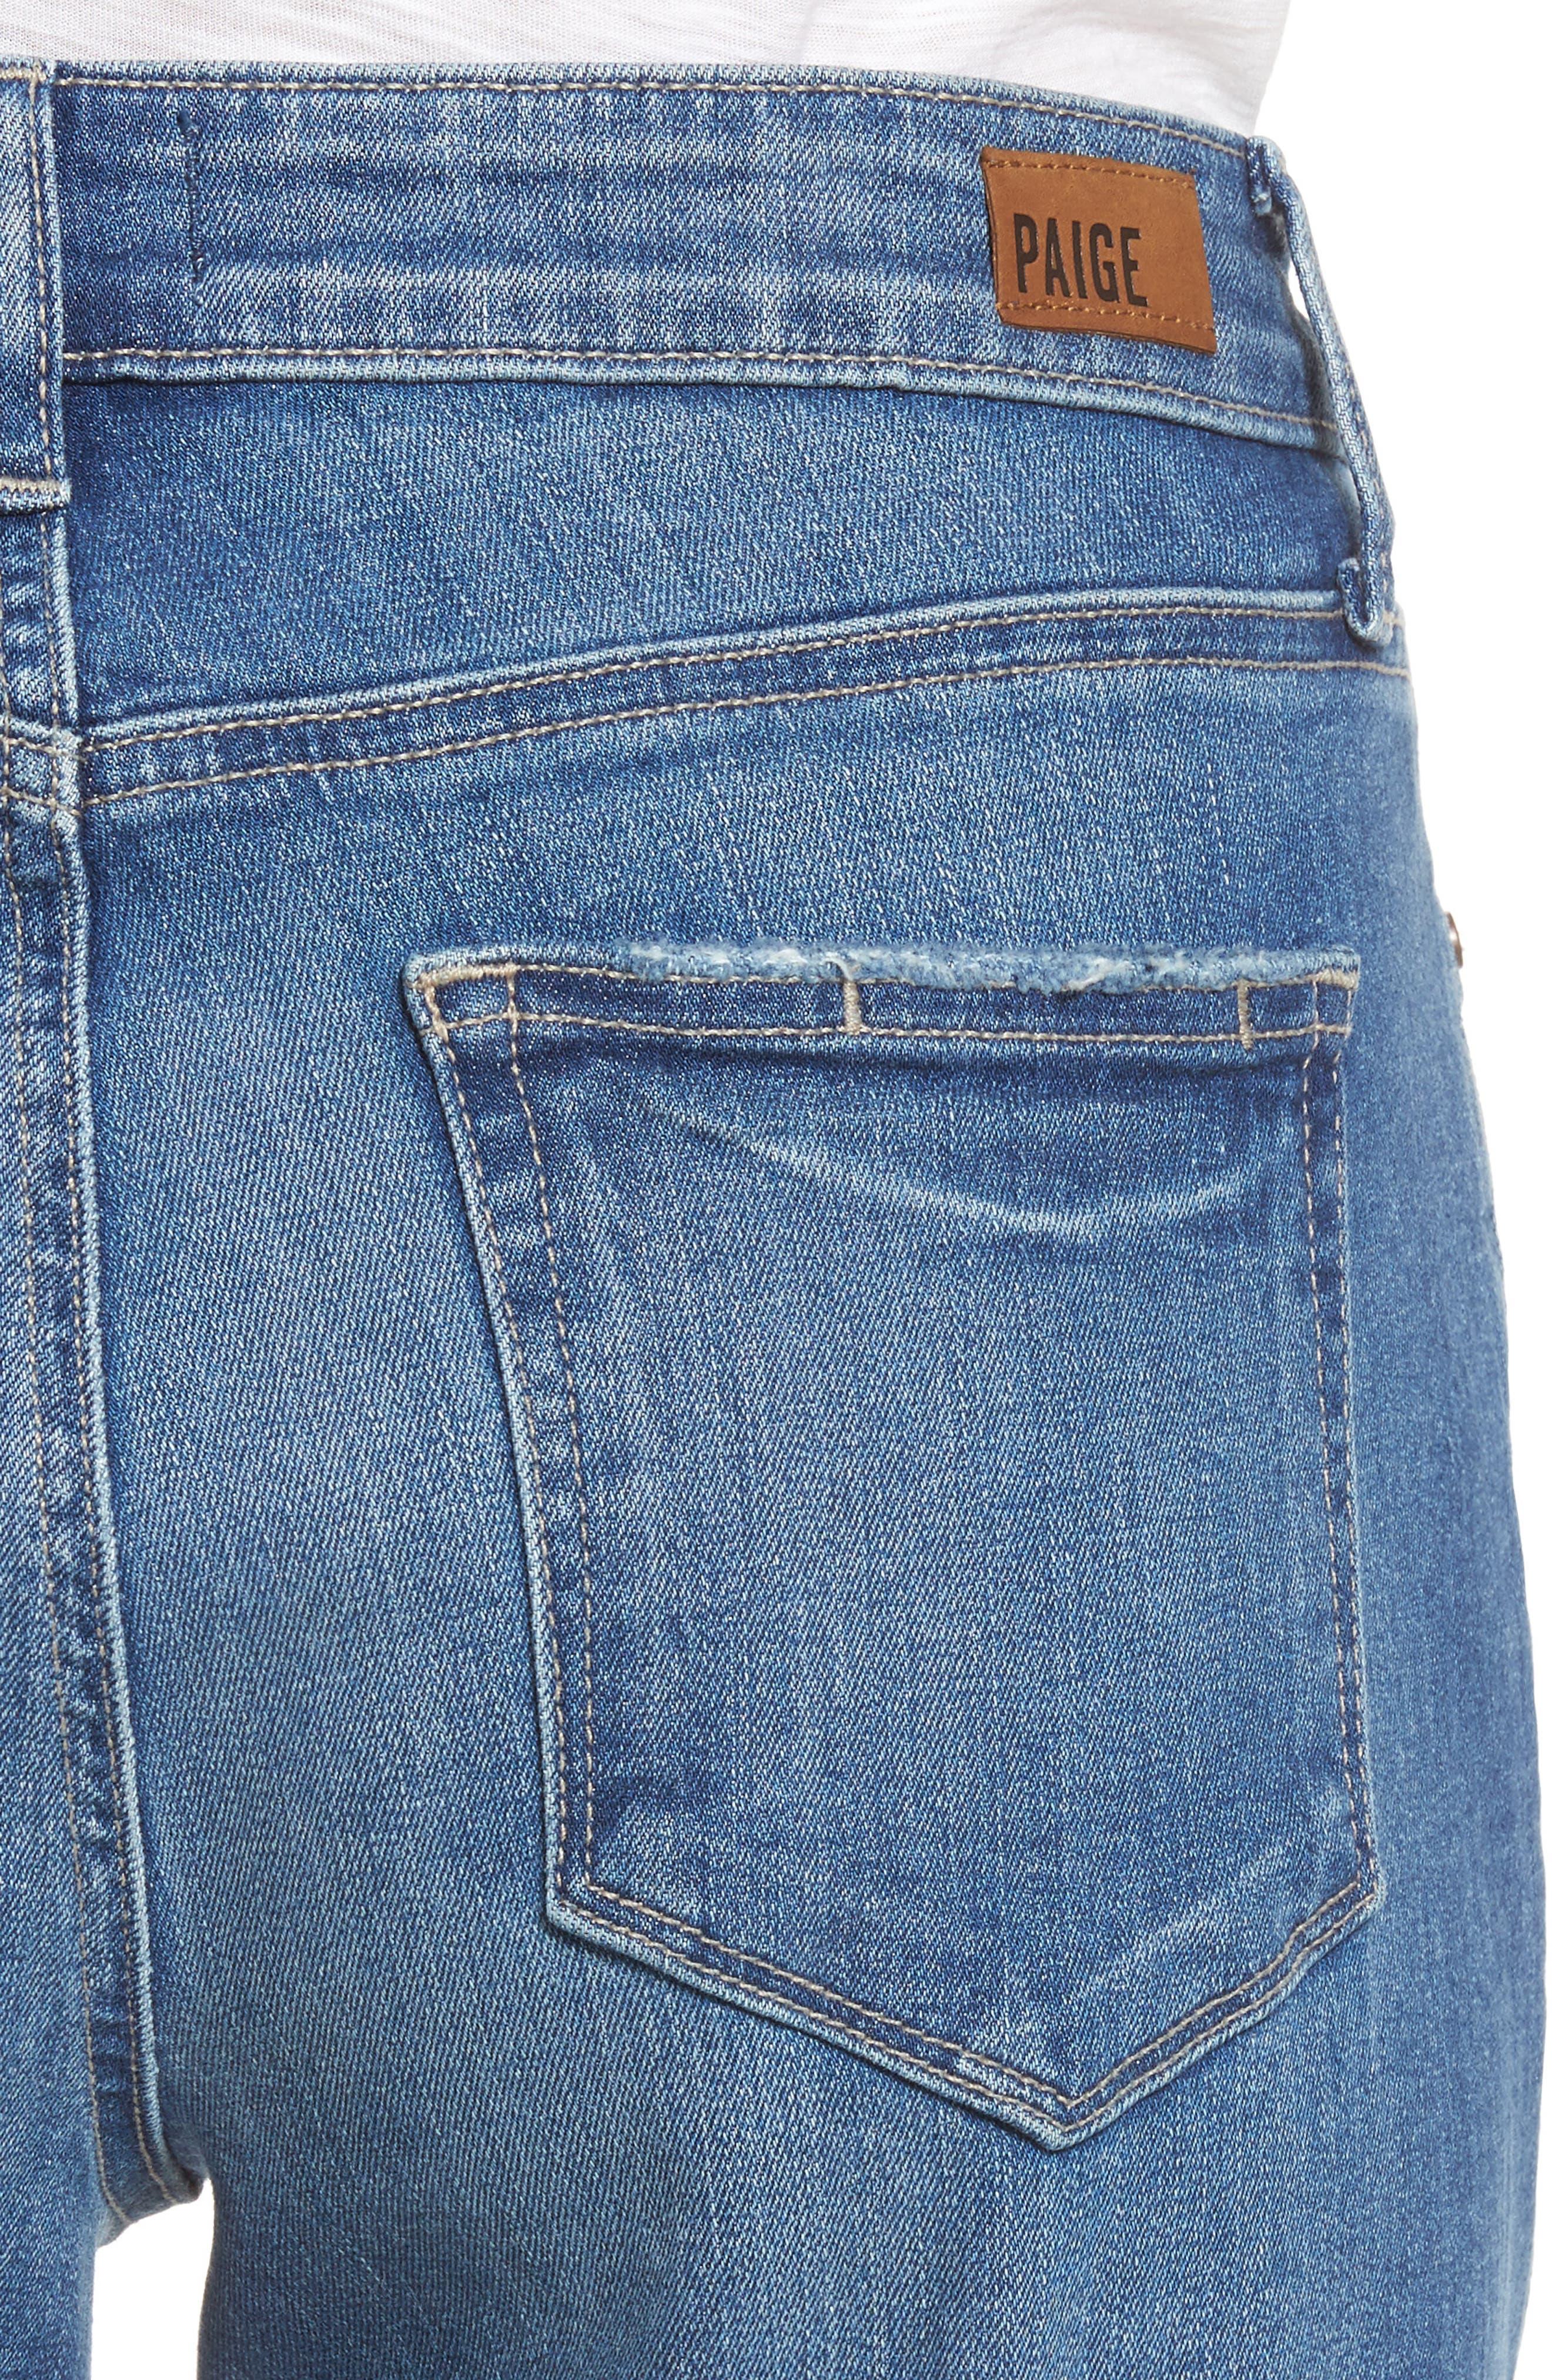 Jimmy Jimmy Transcend Vintage High Waist Crop Boyfriend Jeans,                             Alternate thumbnail 4, color,                             400